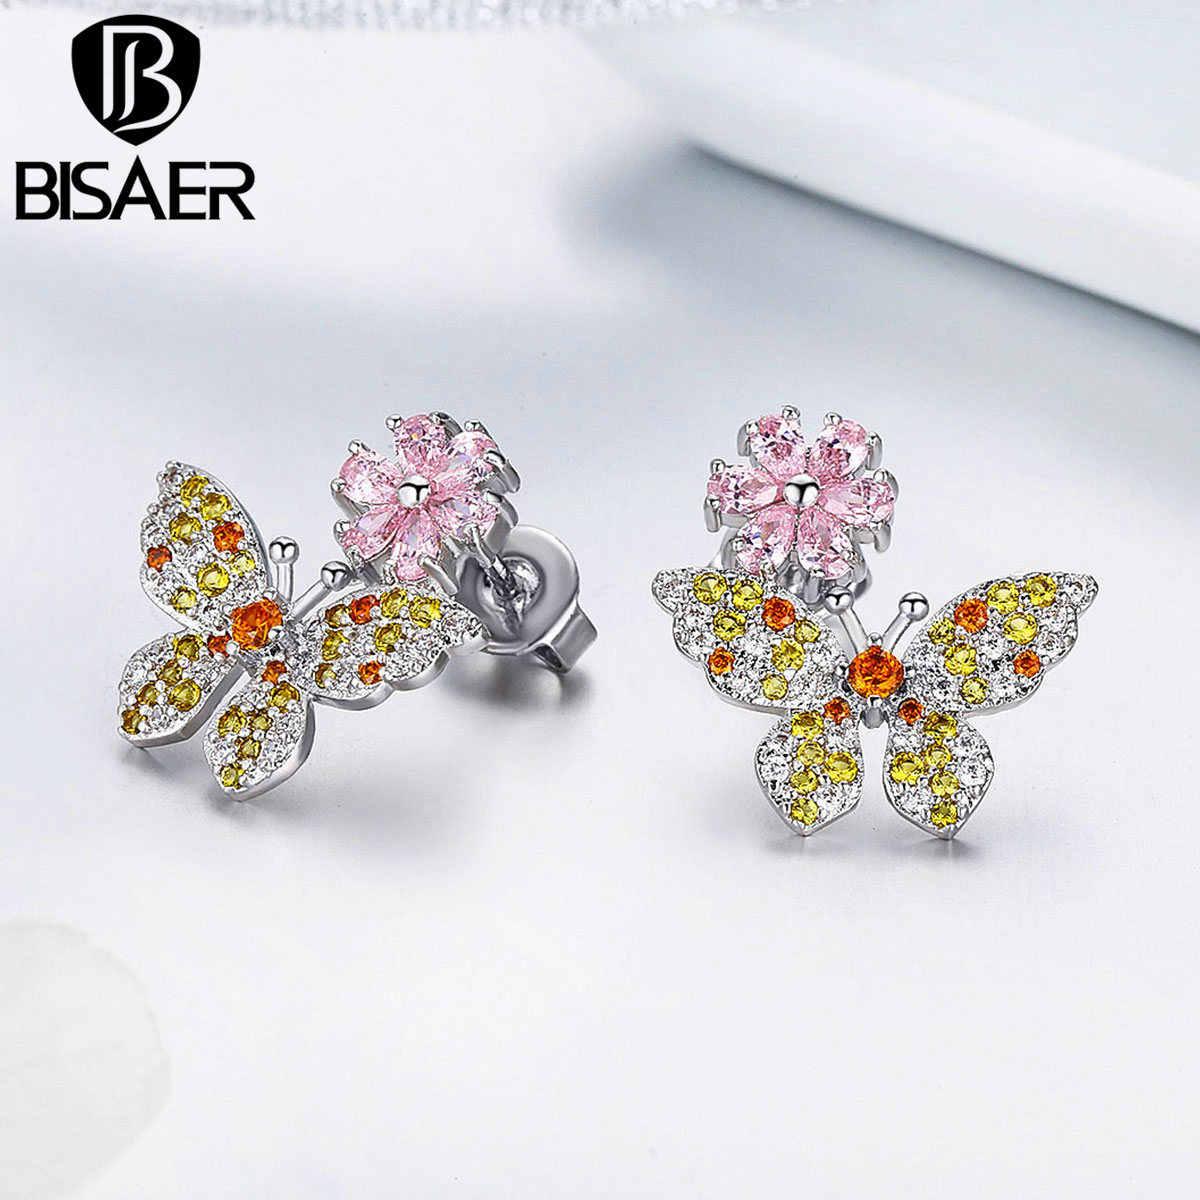 BISAER 2019 新しい高級ピンククリスタルデイジーの花の黄色ジルコンの蝶のスタッドのイヤリング女性の韓国イヤリングジュエリー WEYE190